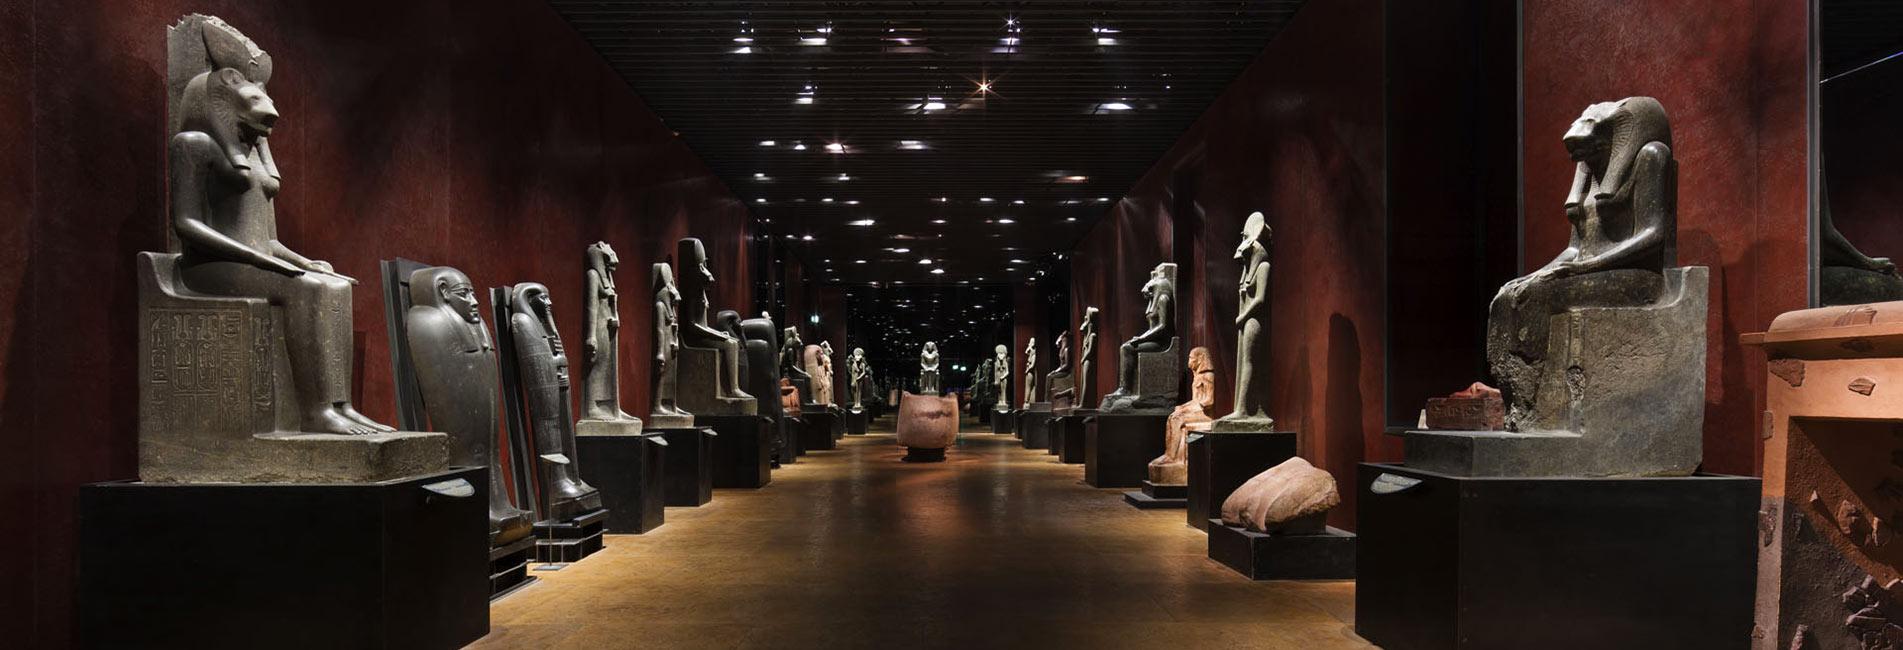 torino-museo-egizio-1